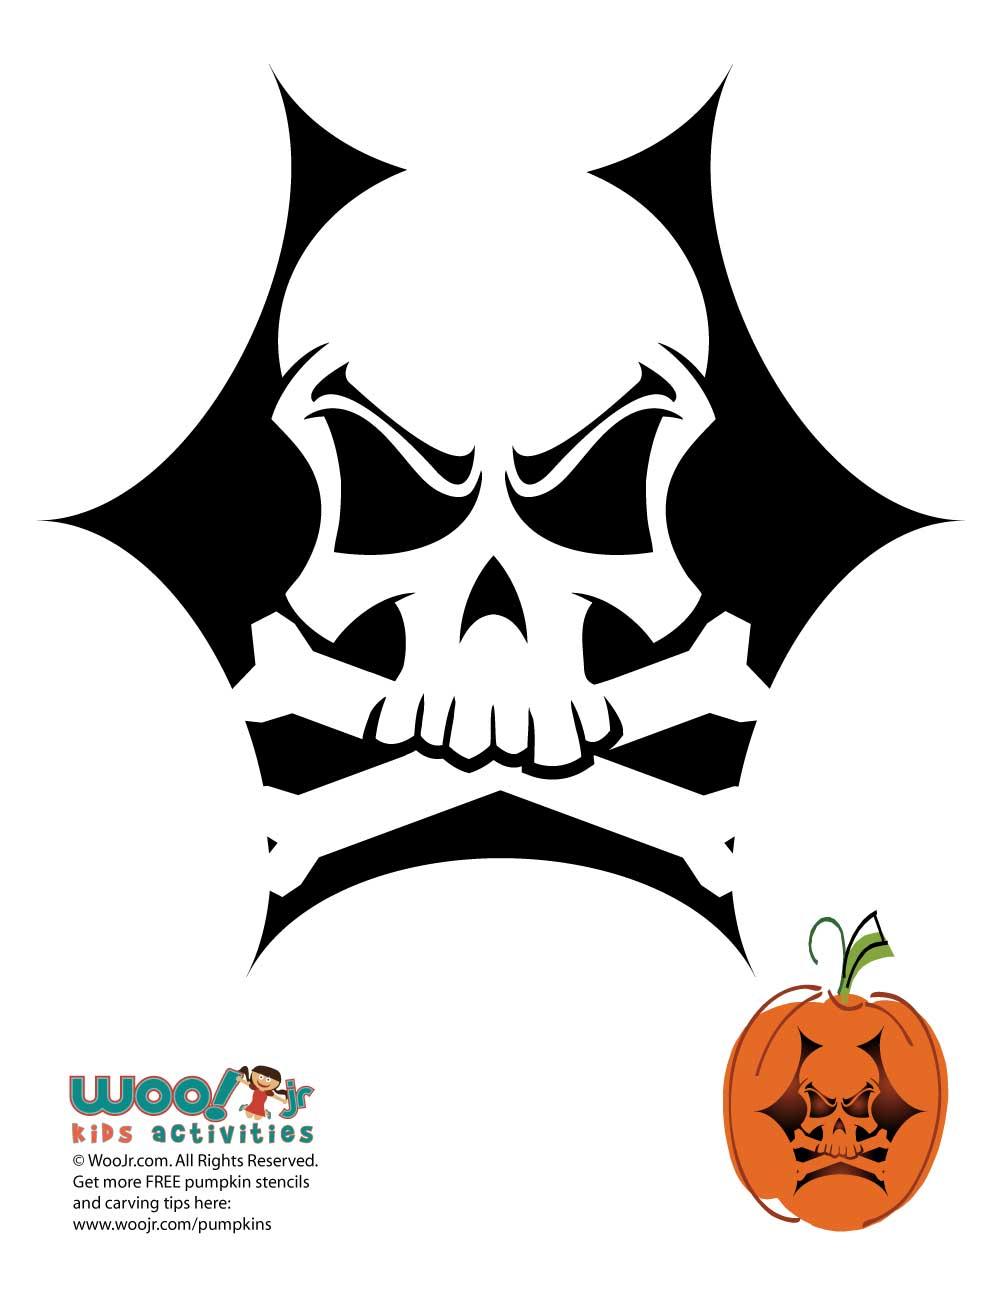 Skull Crossbones Pumpkin Carving Pattern Woo Jr Kids Activities